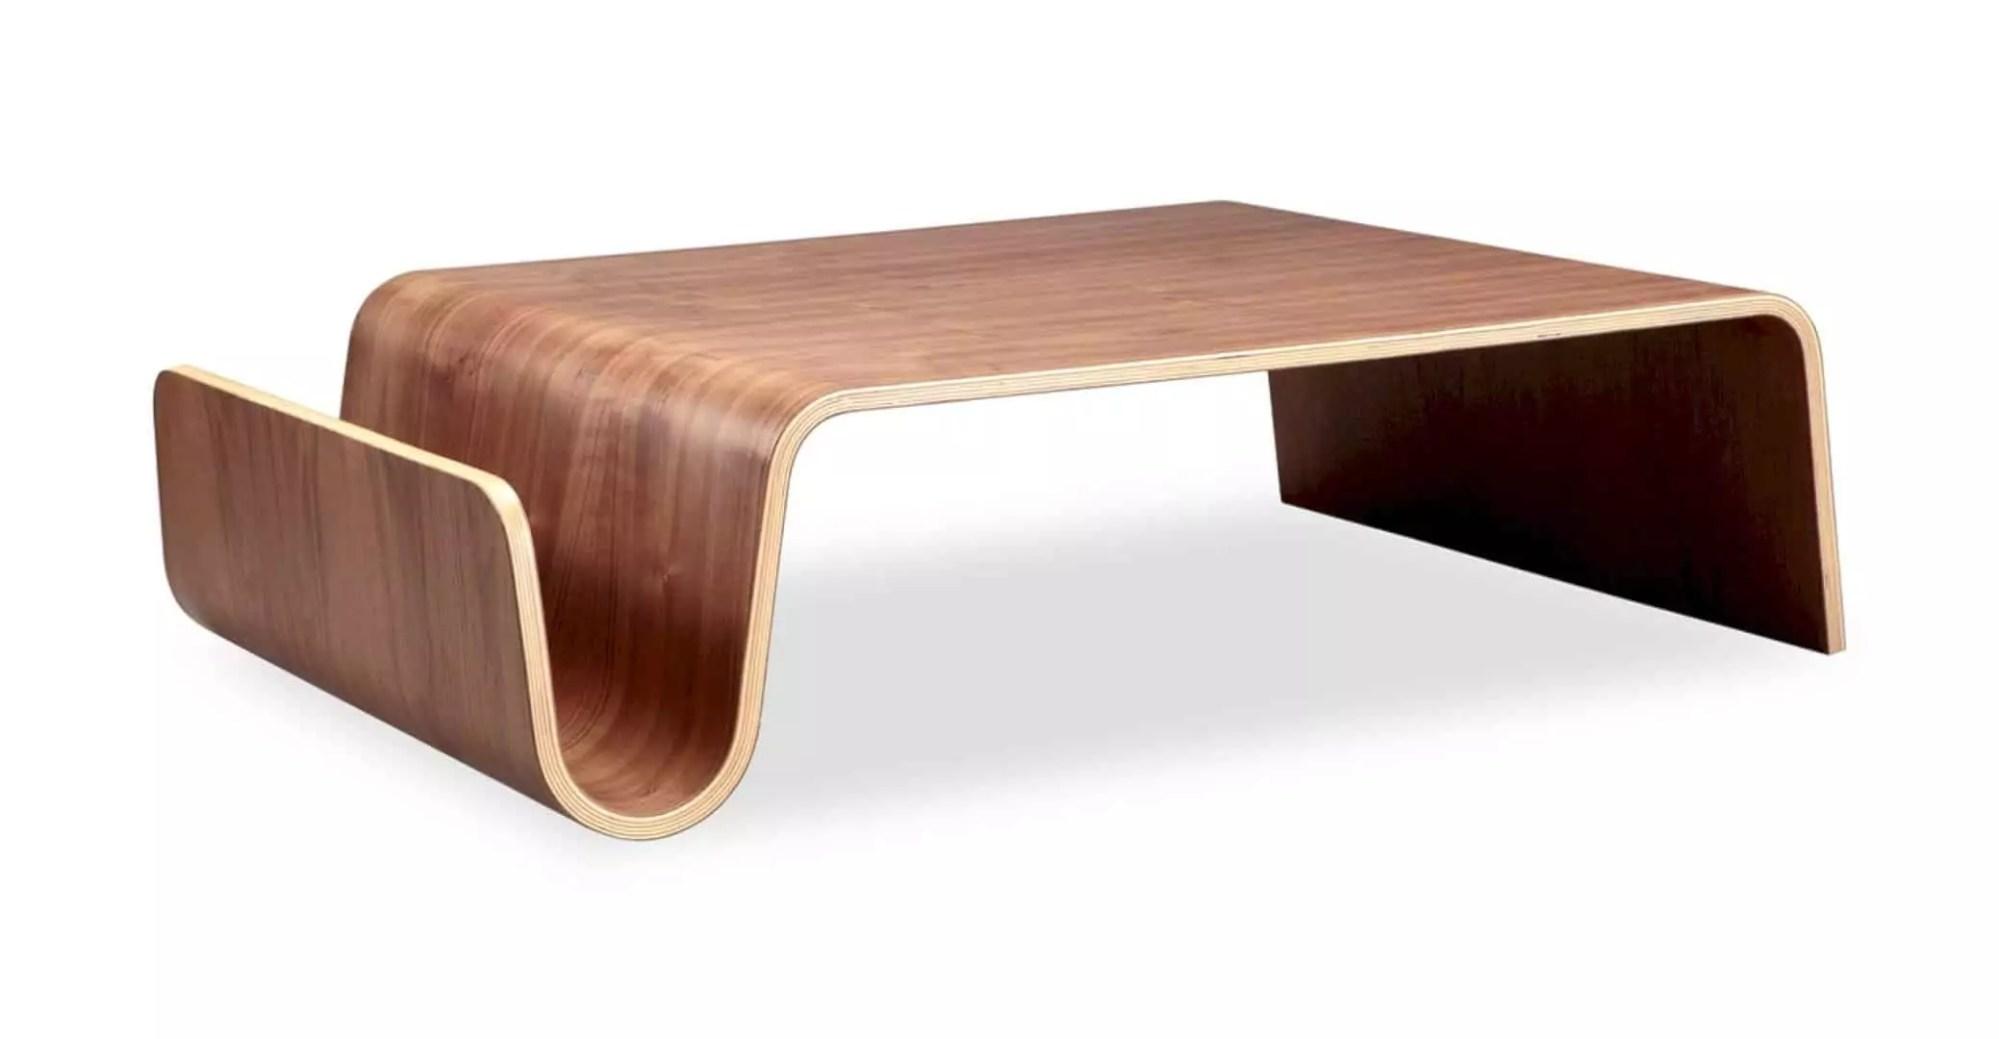 Kardiel Scando Modern Plywood, The Ultimate Stunner Table